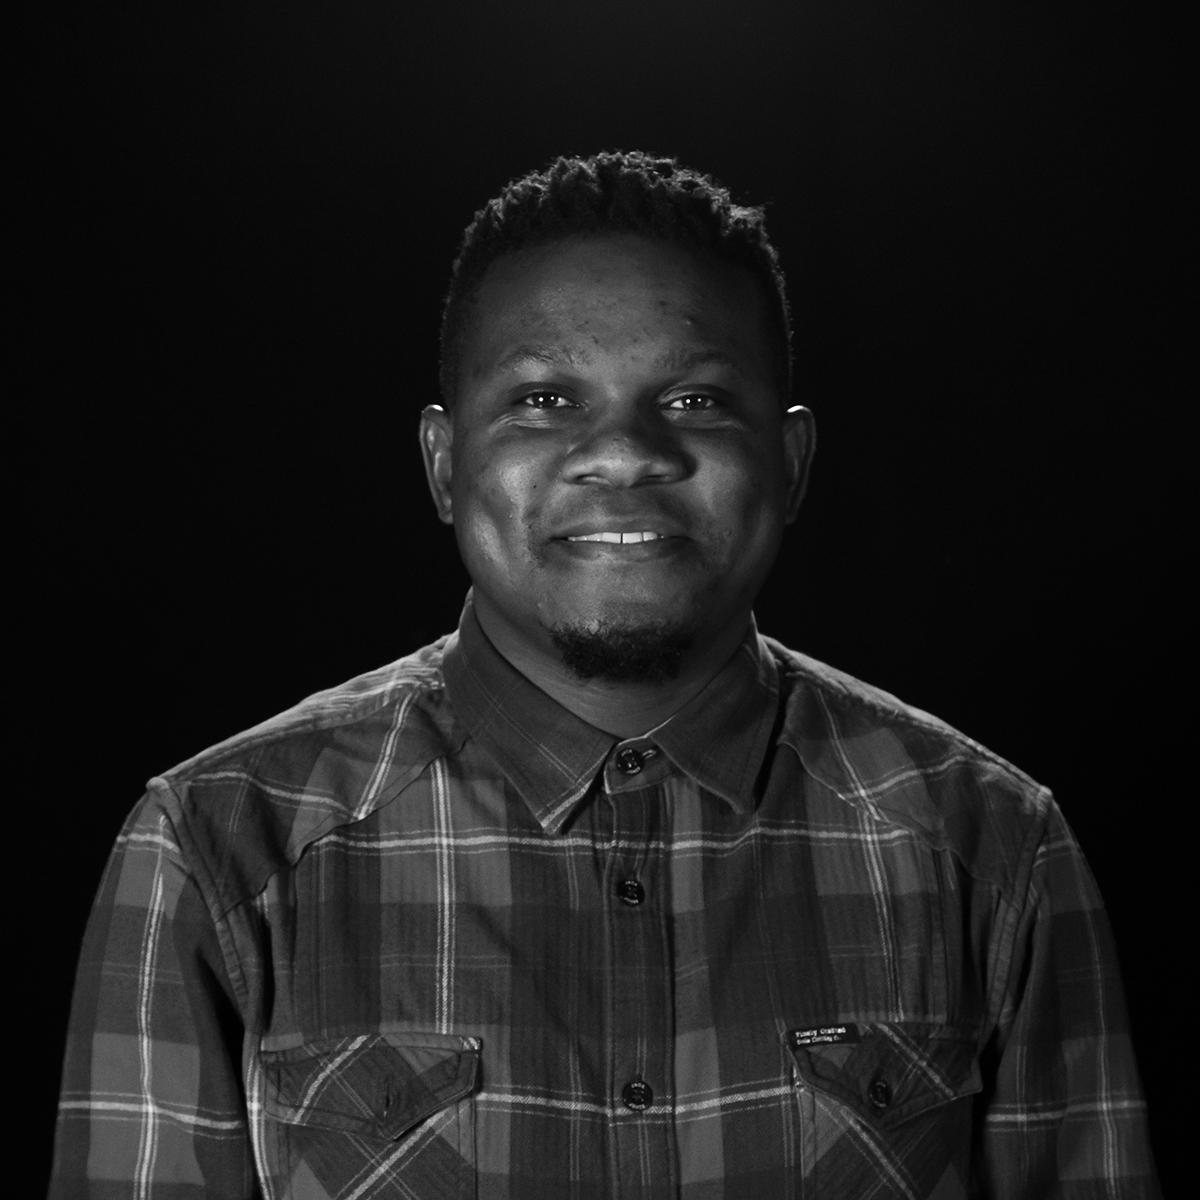 Christian Gwandure